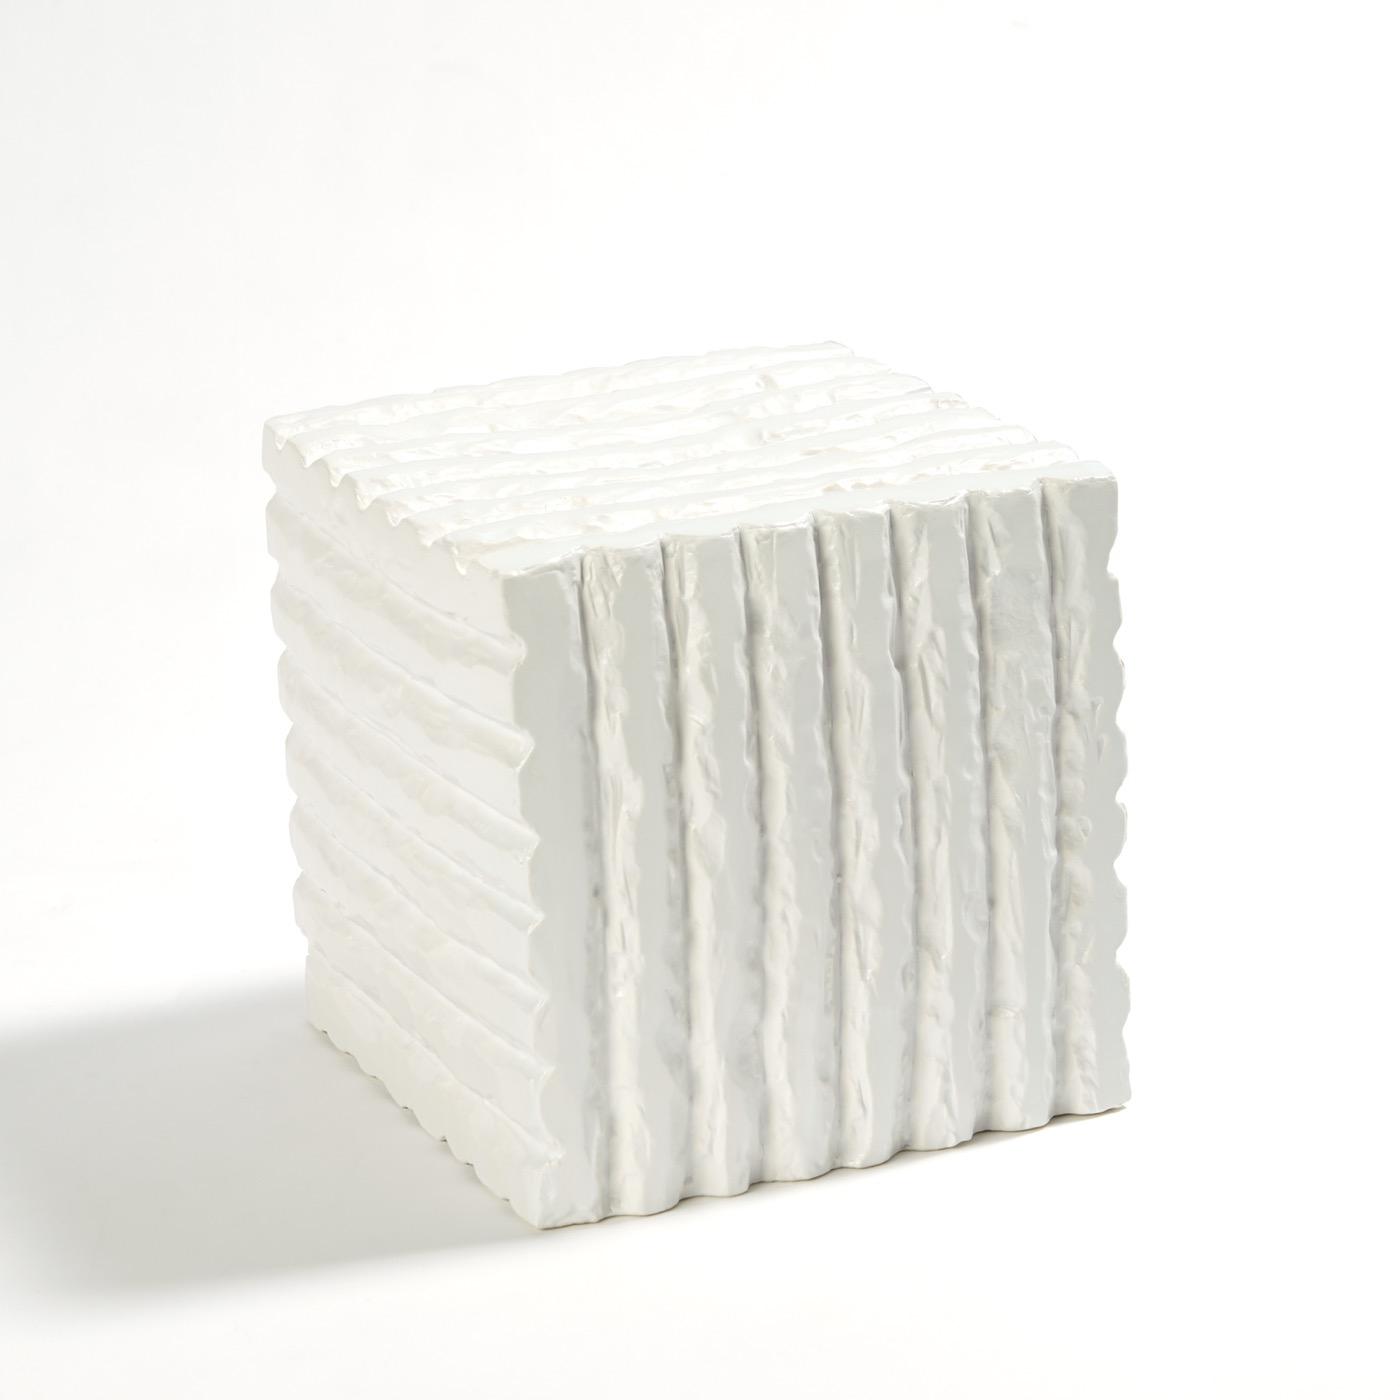 Giza Objects | Cube